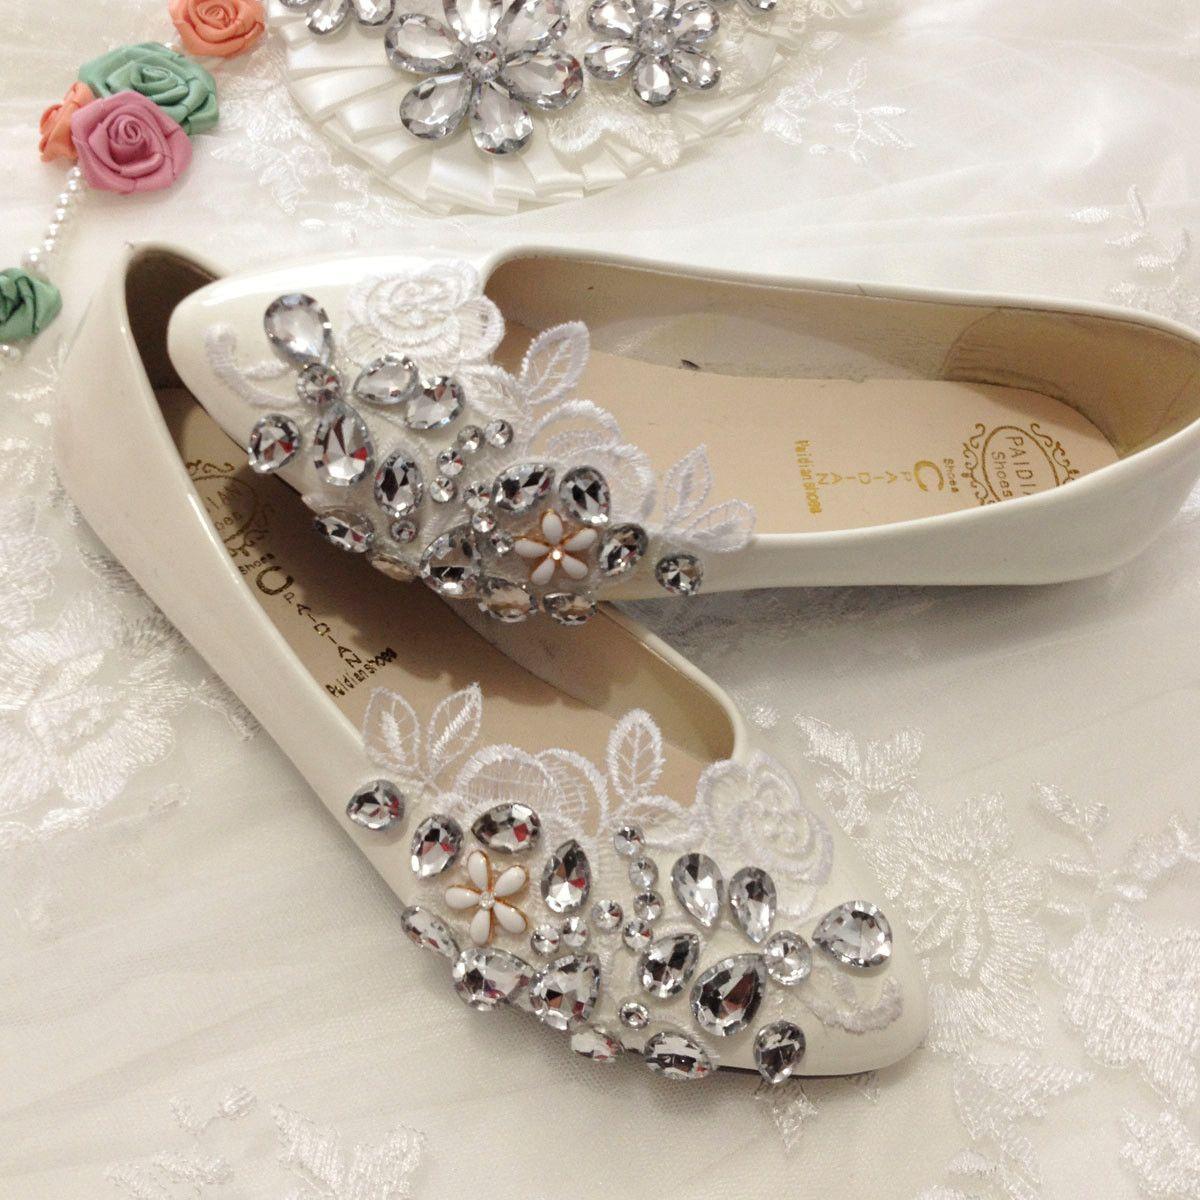 5b4730497ae0c4 Spring and summer beautiful handmade lace flower rhinestone bridal shoes  bridesmaid shoes flat heel white wedding shoes  33.41 LOVE!